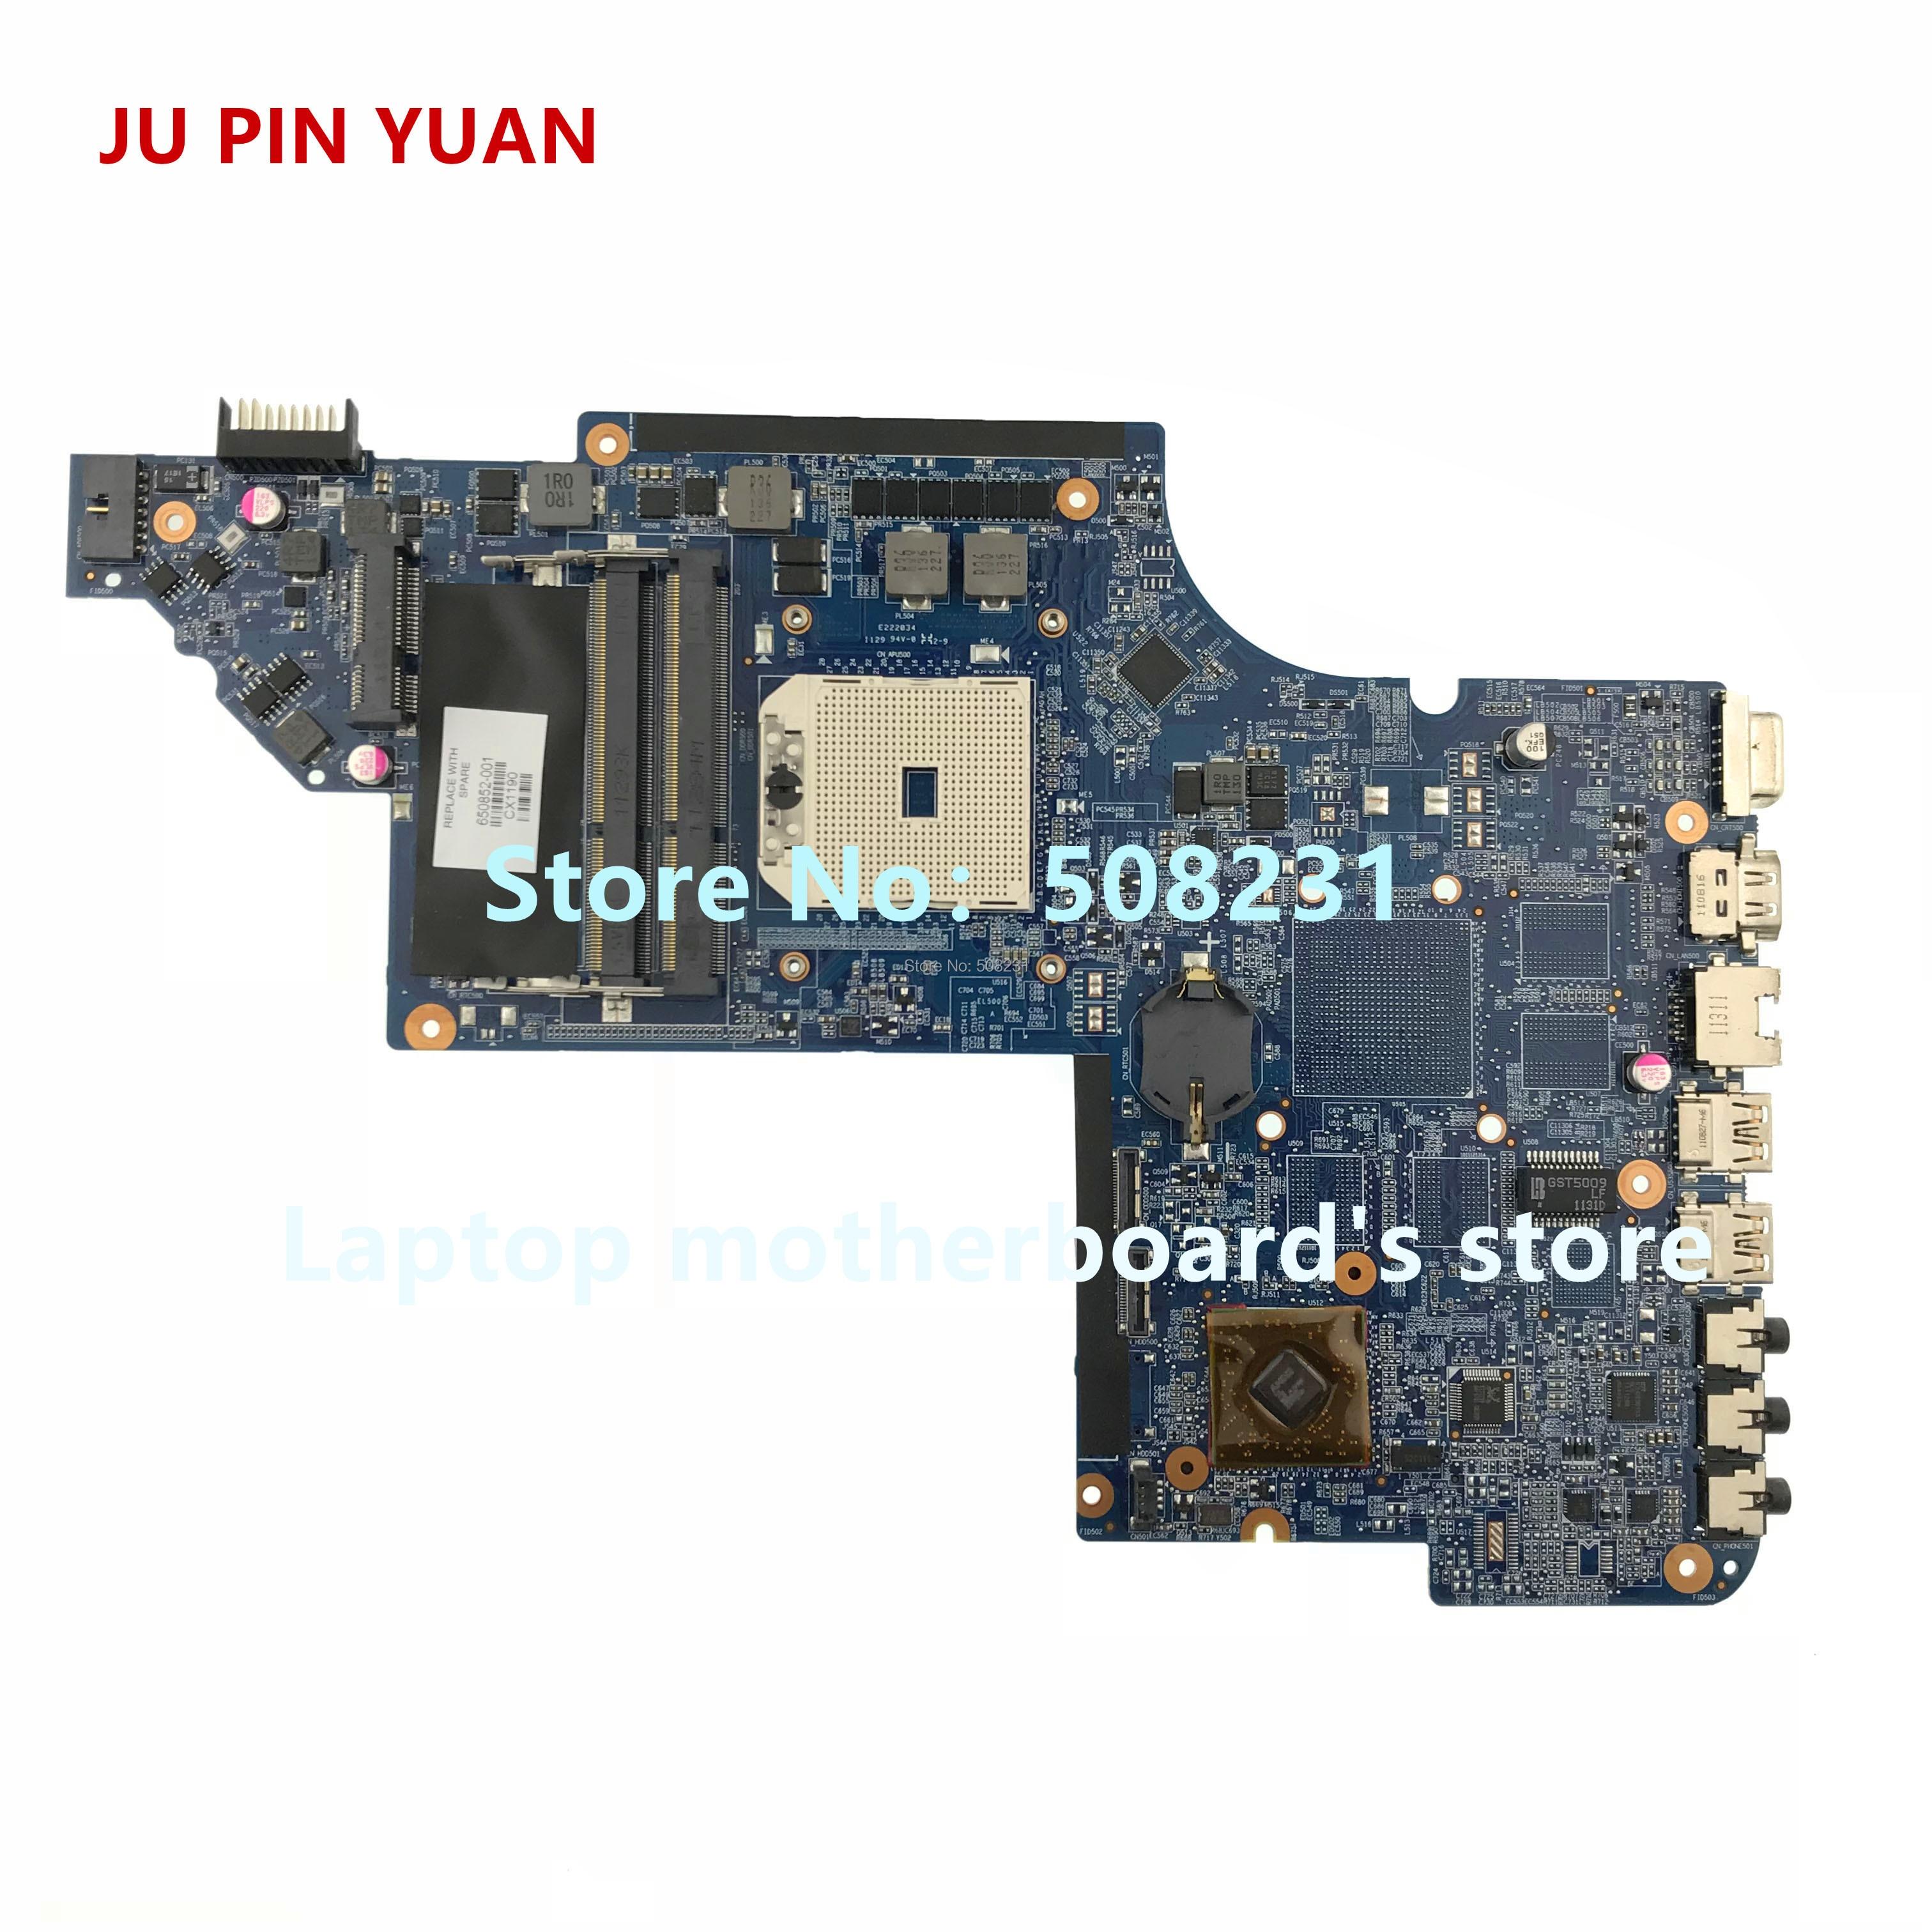 650852 (1)